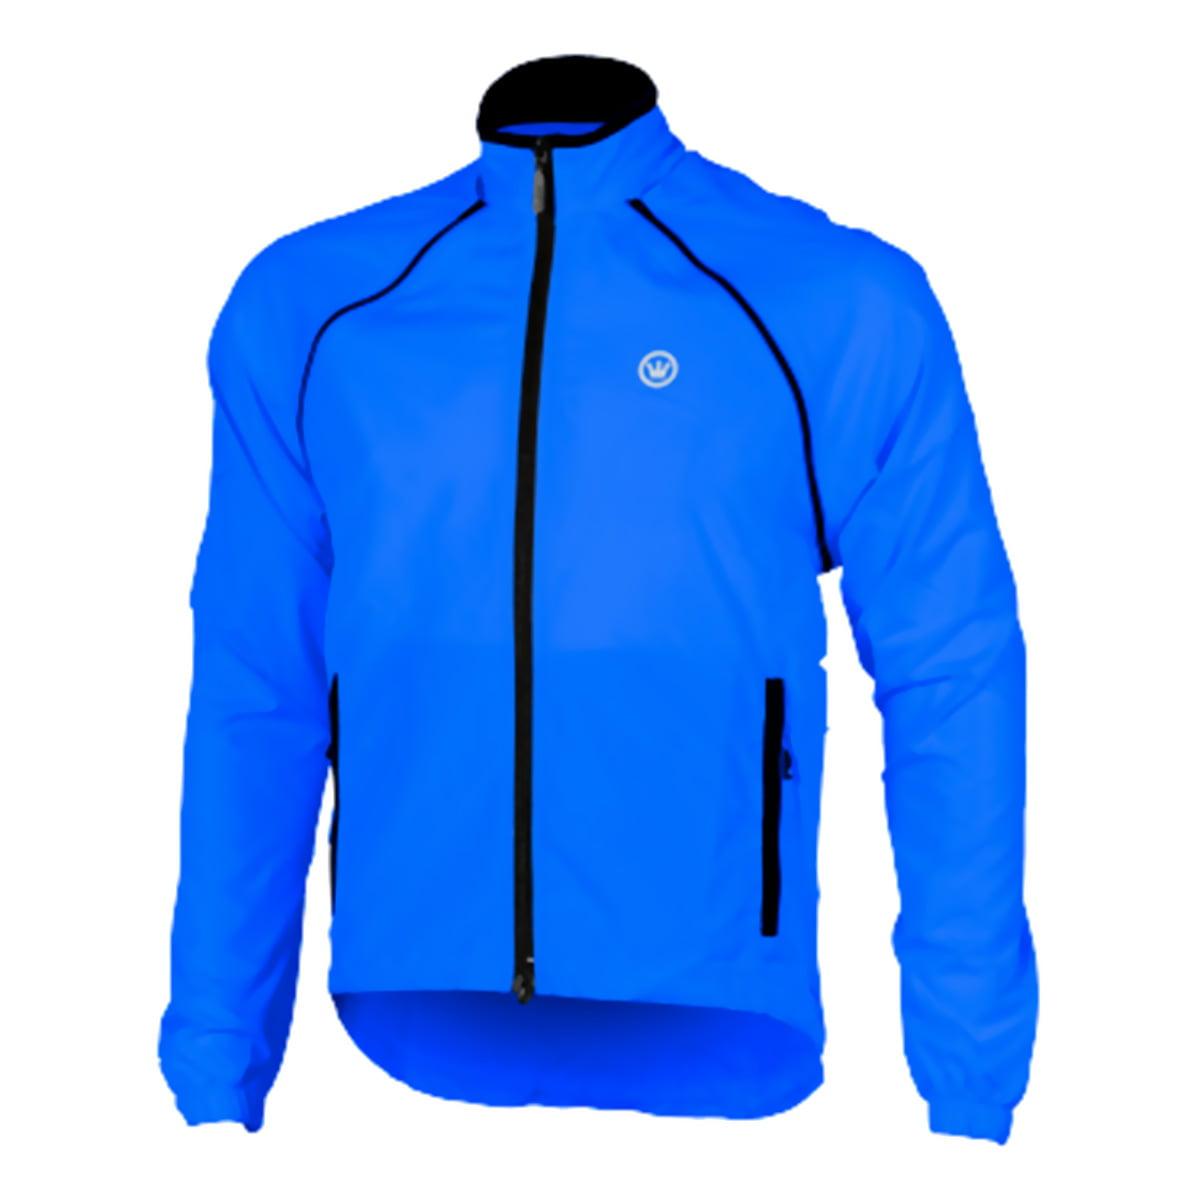 Canari Cyclewear 2015 Men's Eclipse II Cycling Jacket - 1760